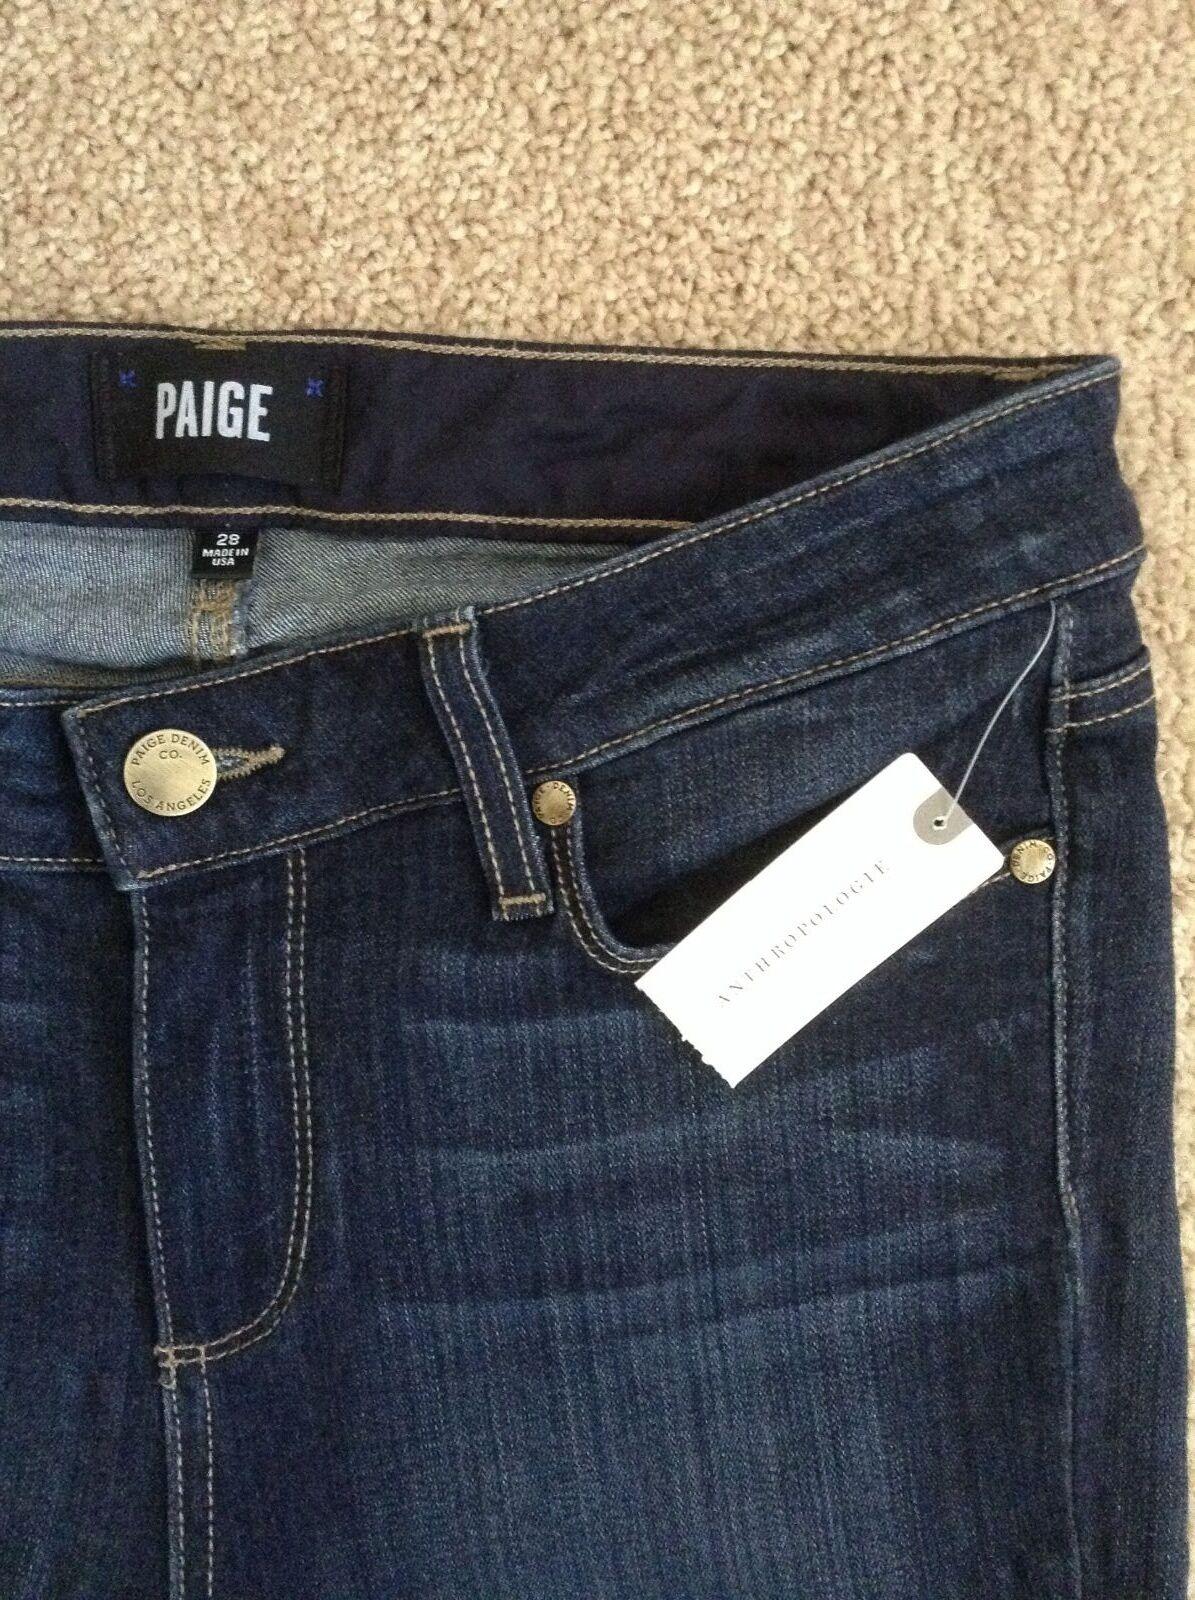 NEW PAIGE  189 Skyline 'Transcend' Crop Mid-Rise Skinny JeansZora Wash28 Waist